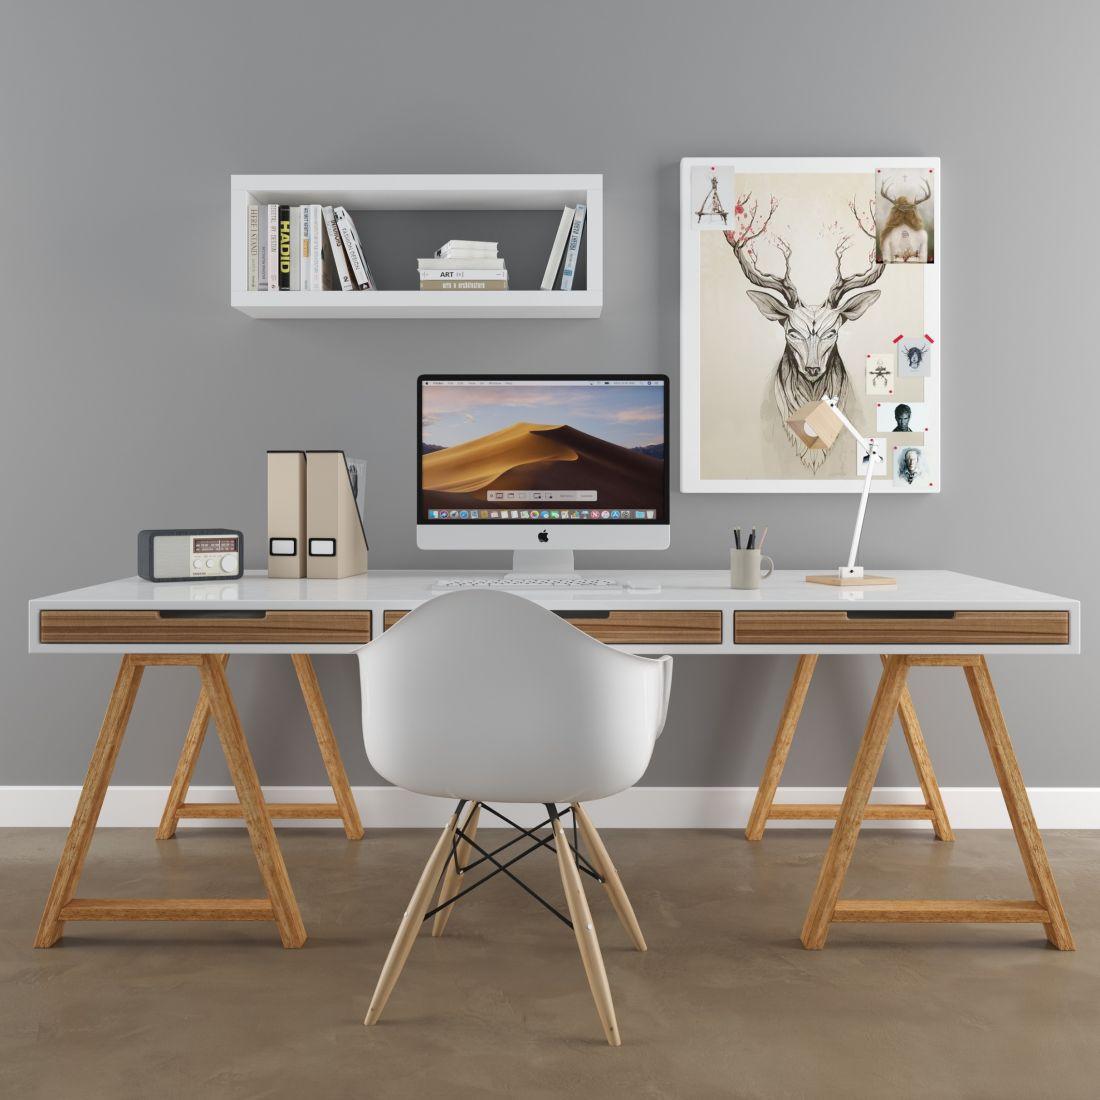 Image of: Desk Scandinavian Set Ikea 3d Model For Vray Corona